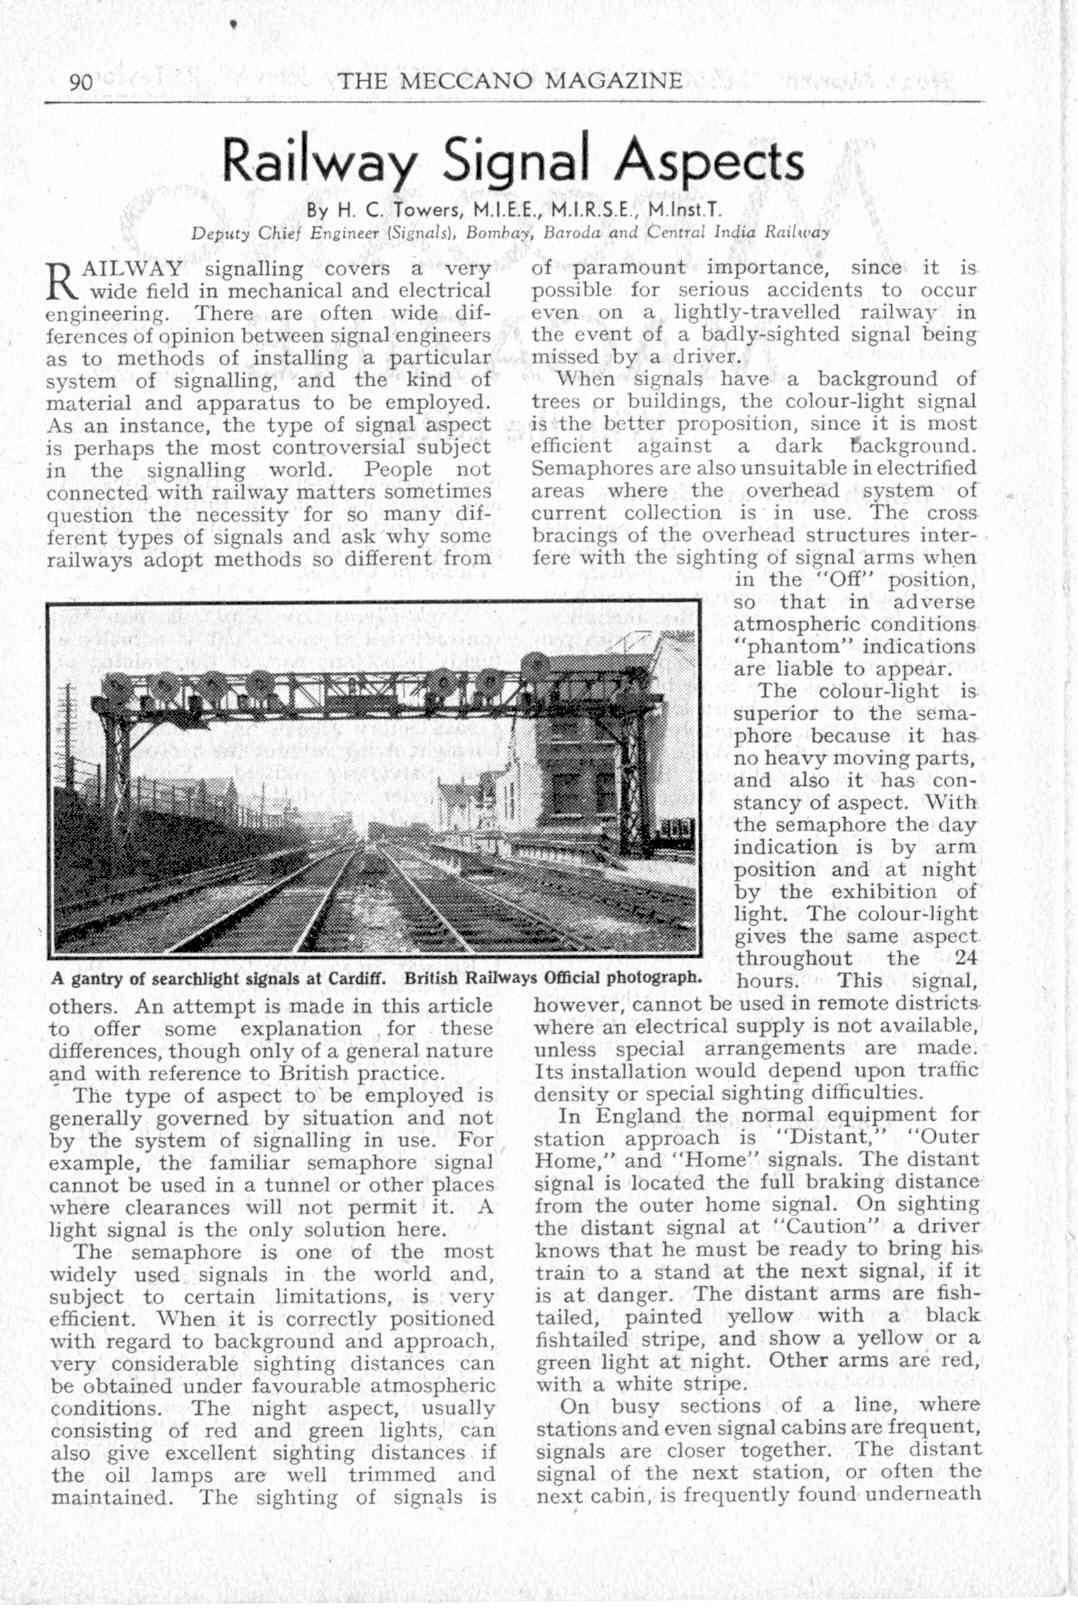 UK Meccano Magazine March 1949 Page 90